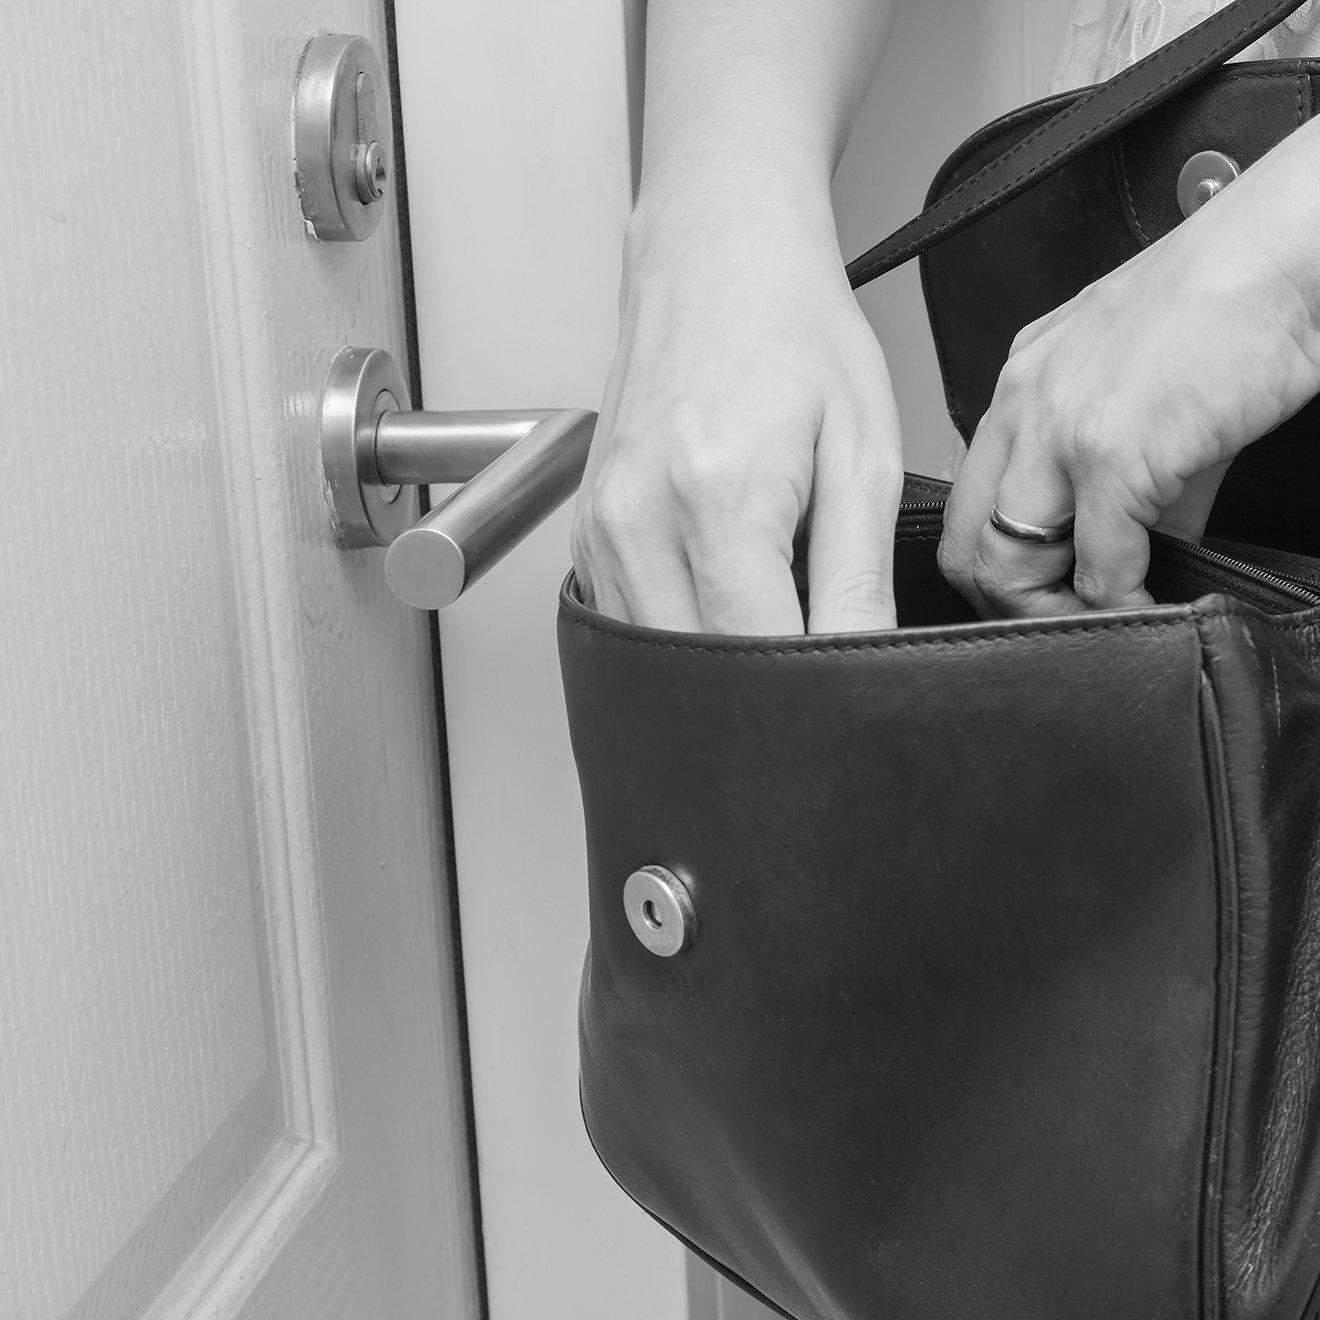 Emergency locksmith services Oldham - Cyro Services